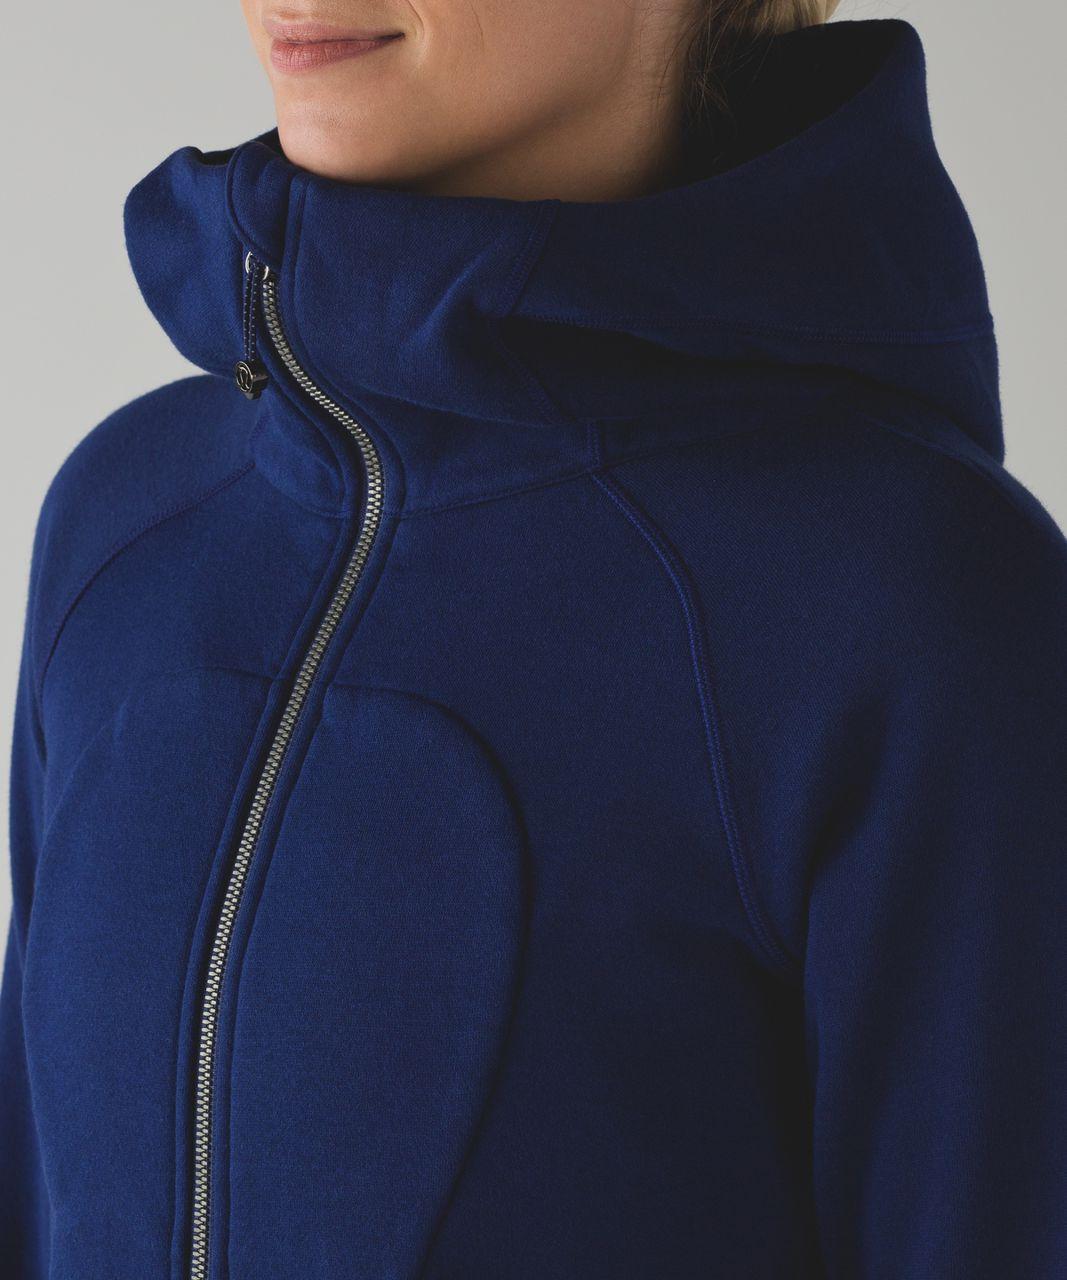 Lululemon Scuba Hoodie III - Hero Blue